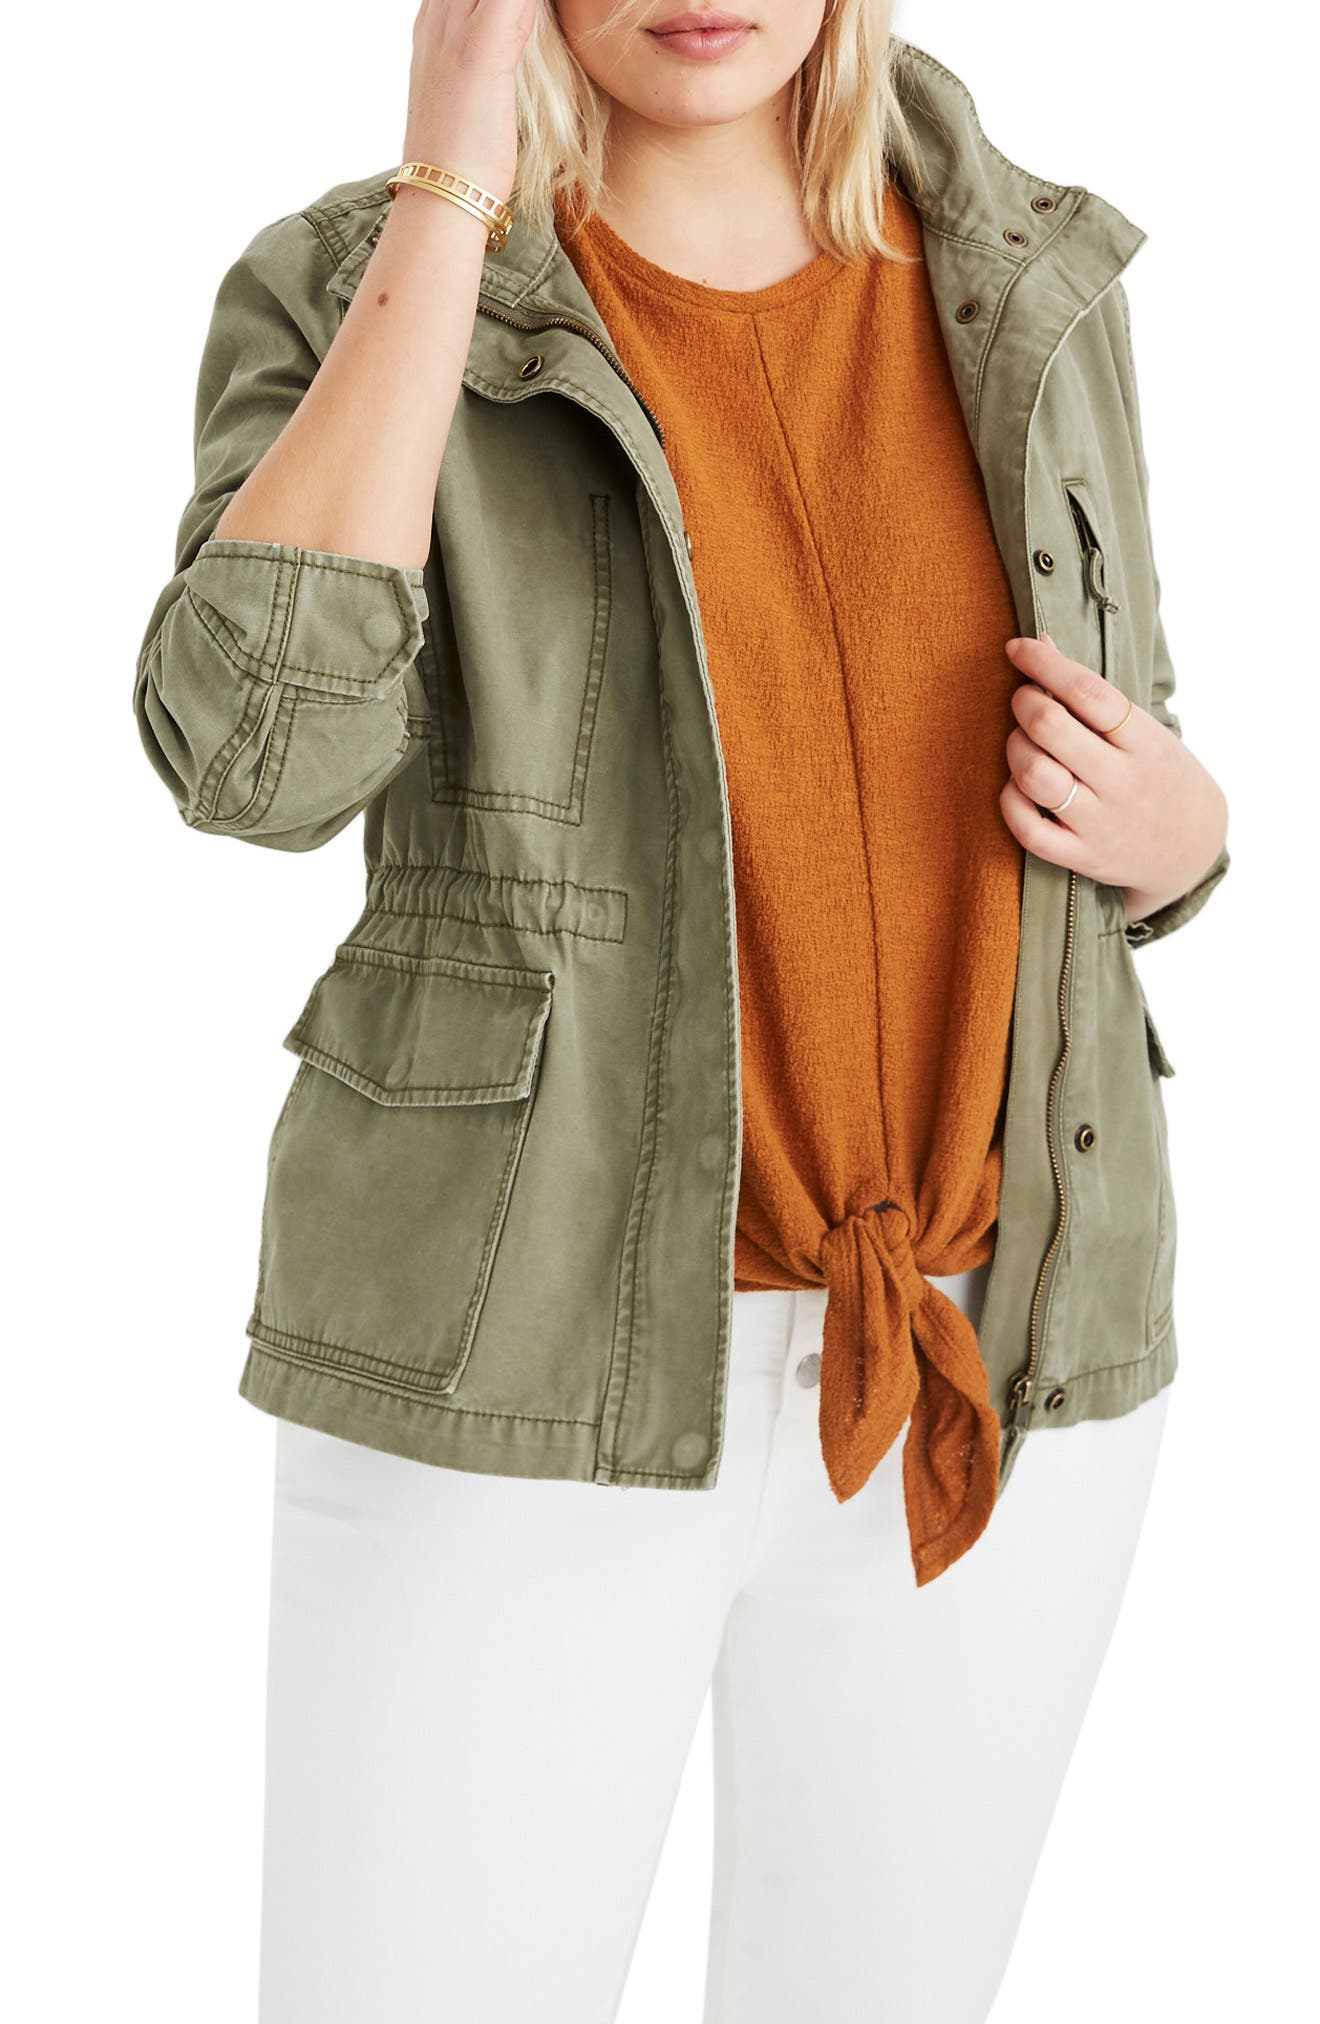 MADEWELL,                             Surplus Cotton Jacket,                             Alternate thumbnail 2, color,                             DESERT OLIVE